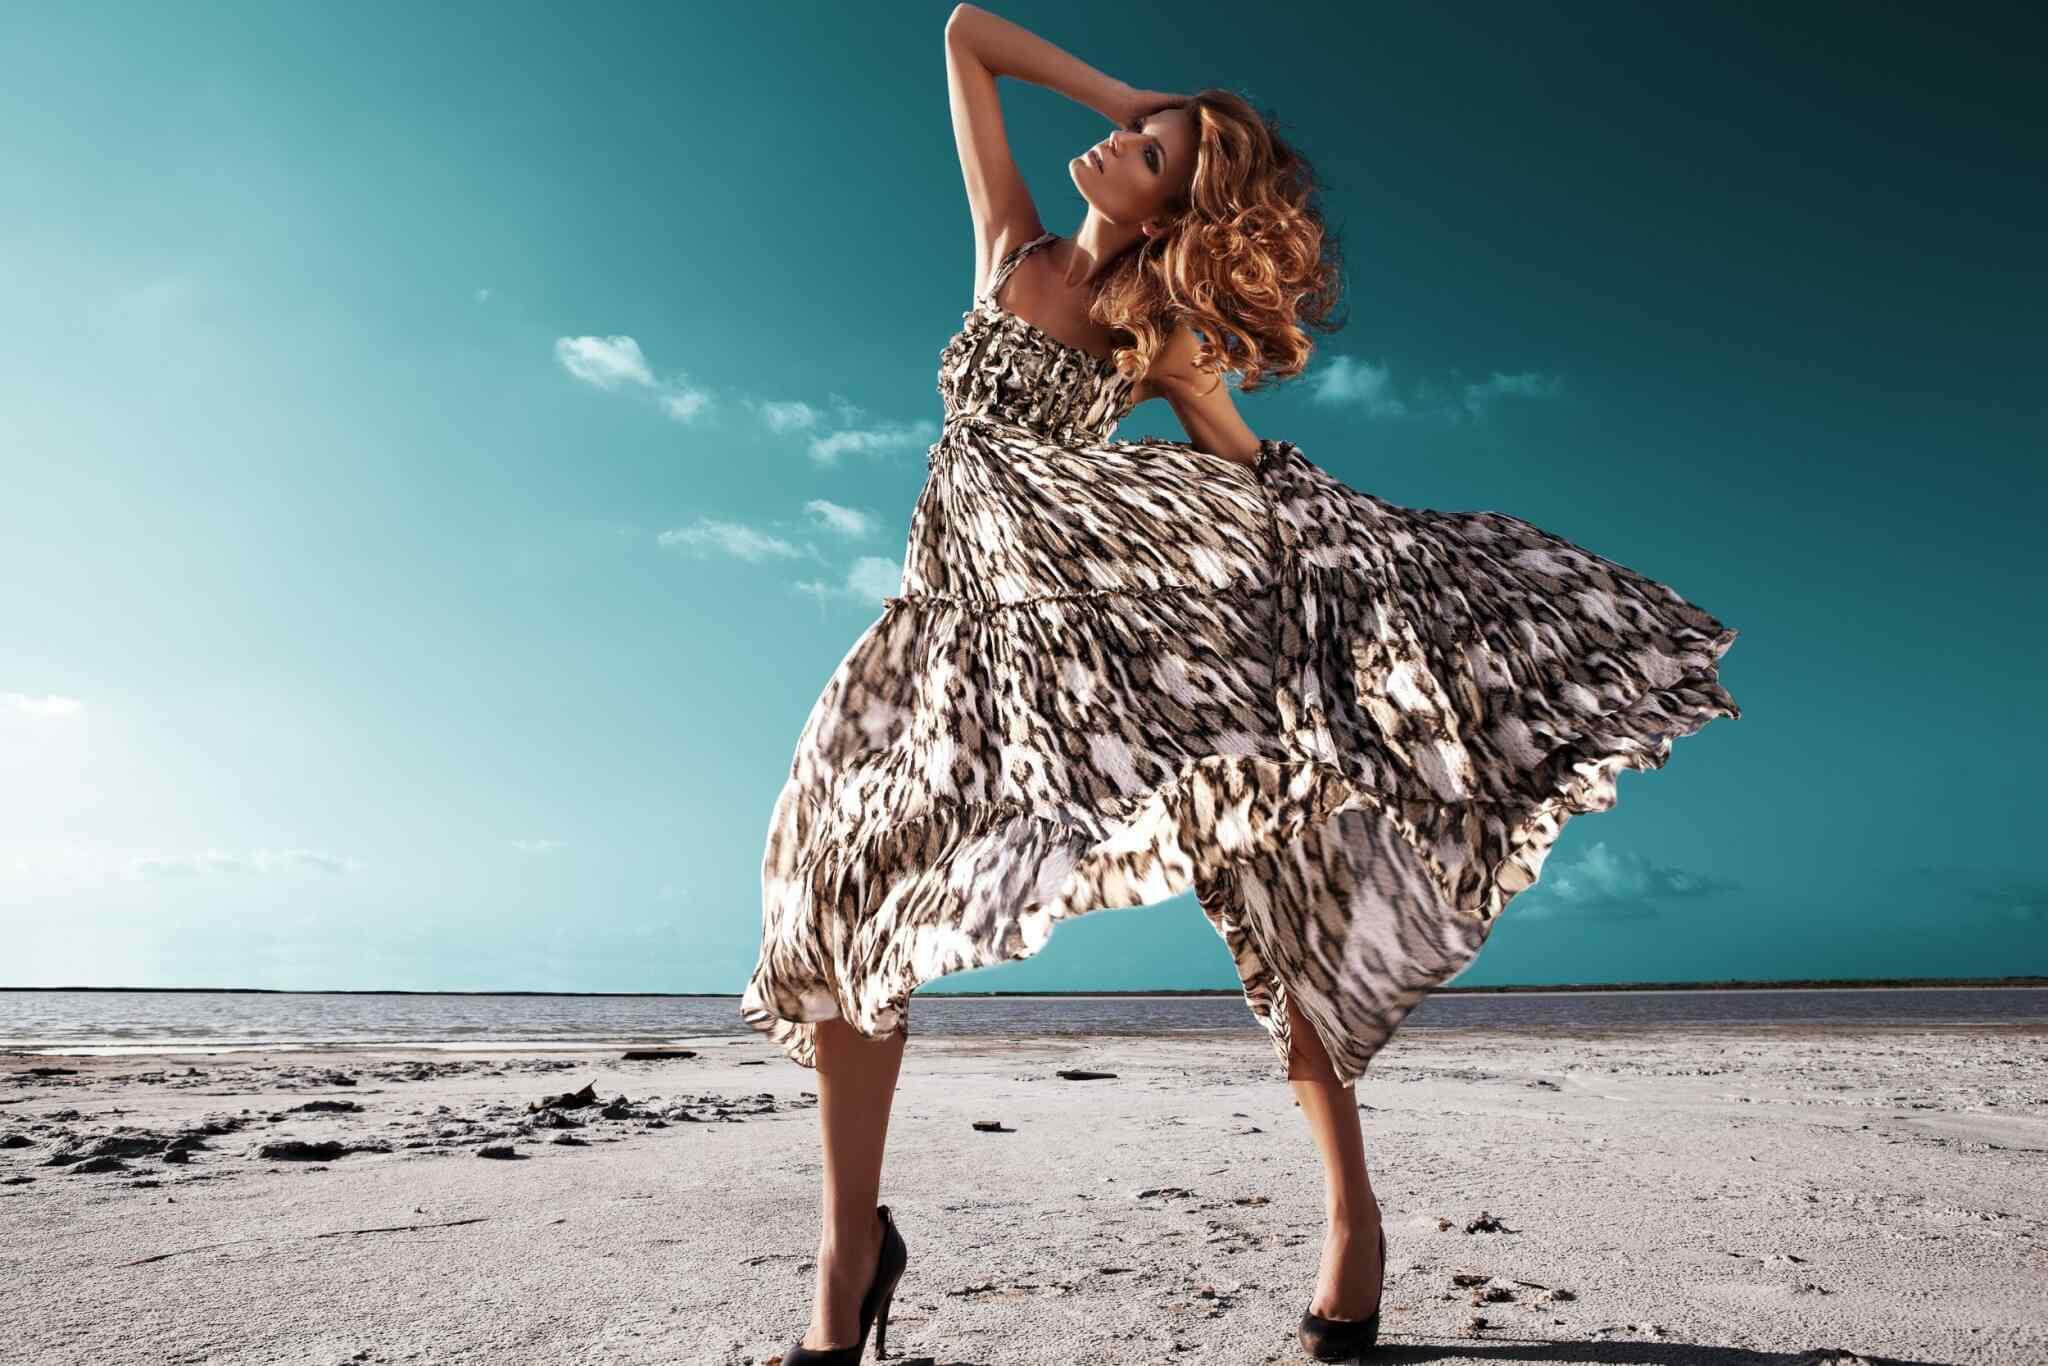 https://www.difesaeprevidenza.it/wp-content/uploads/2017/03/fashion_3.jpg